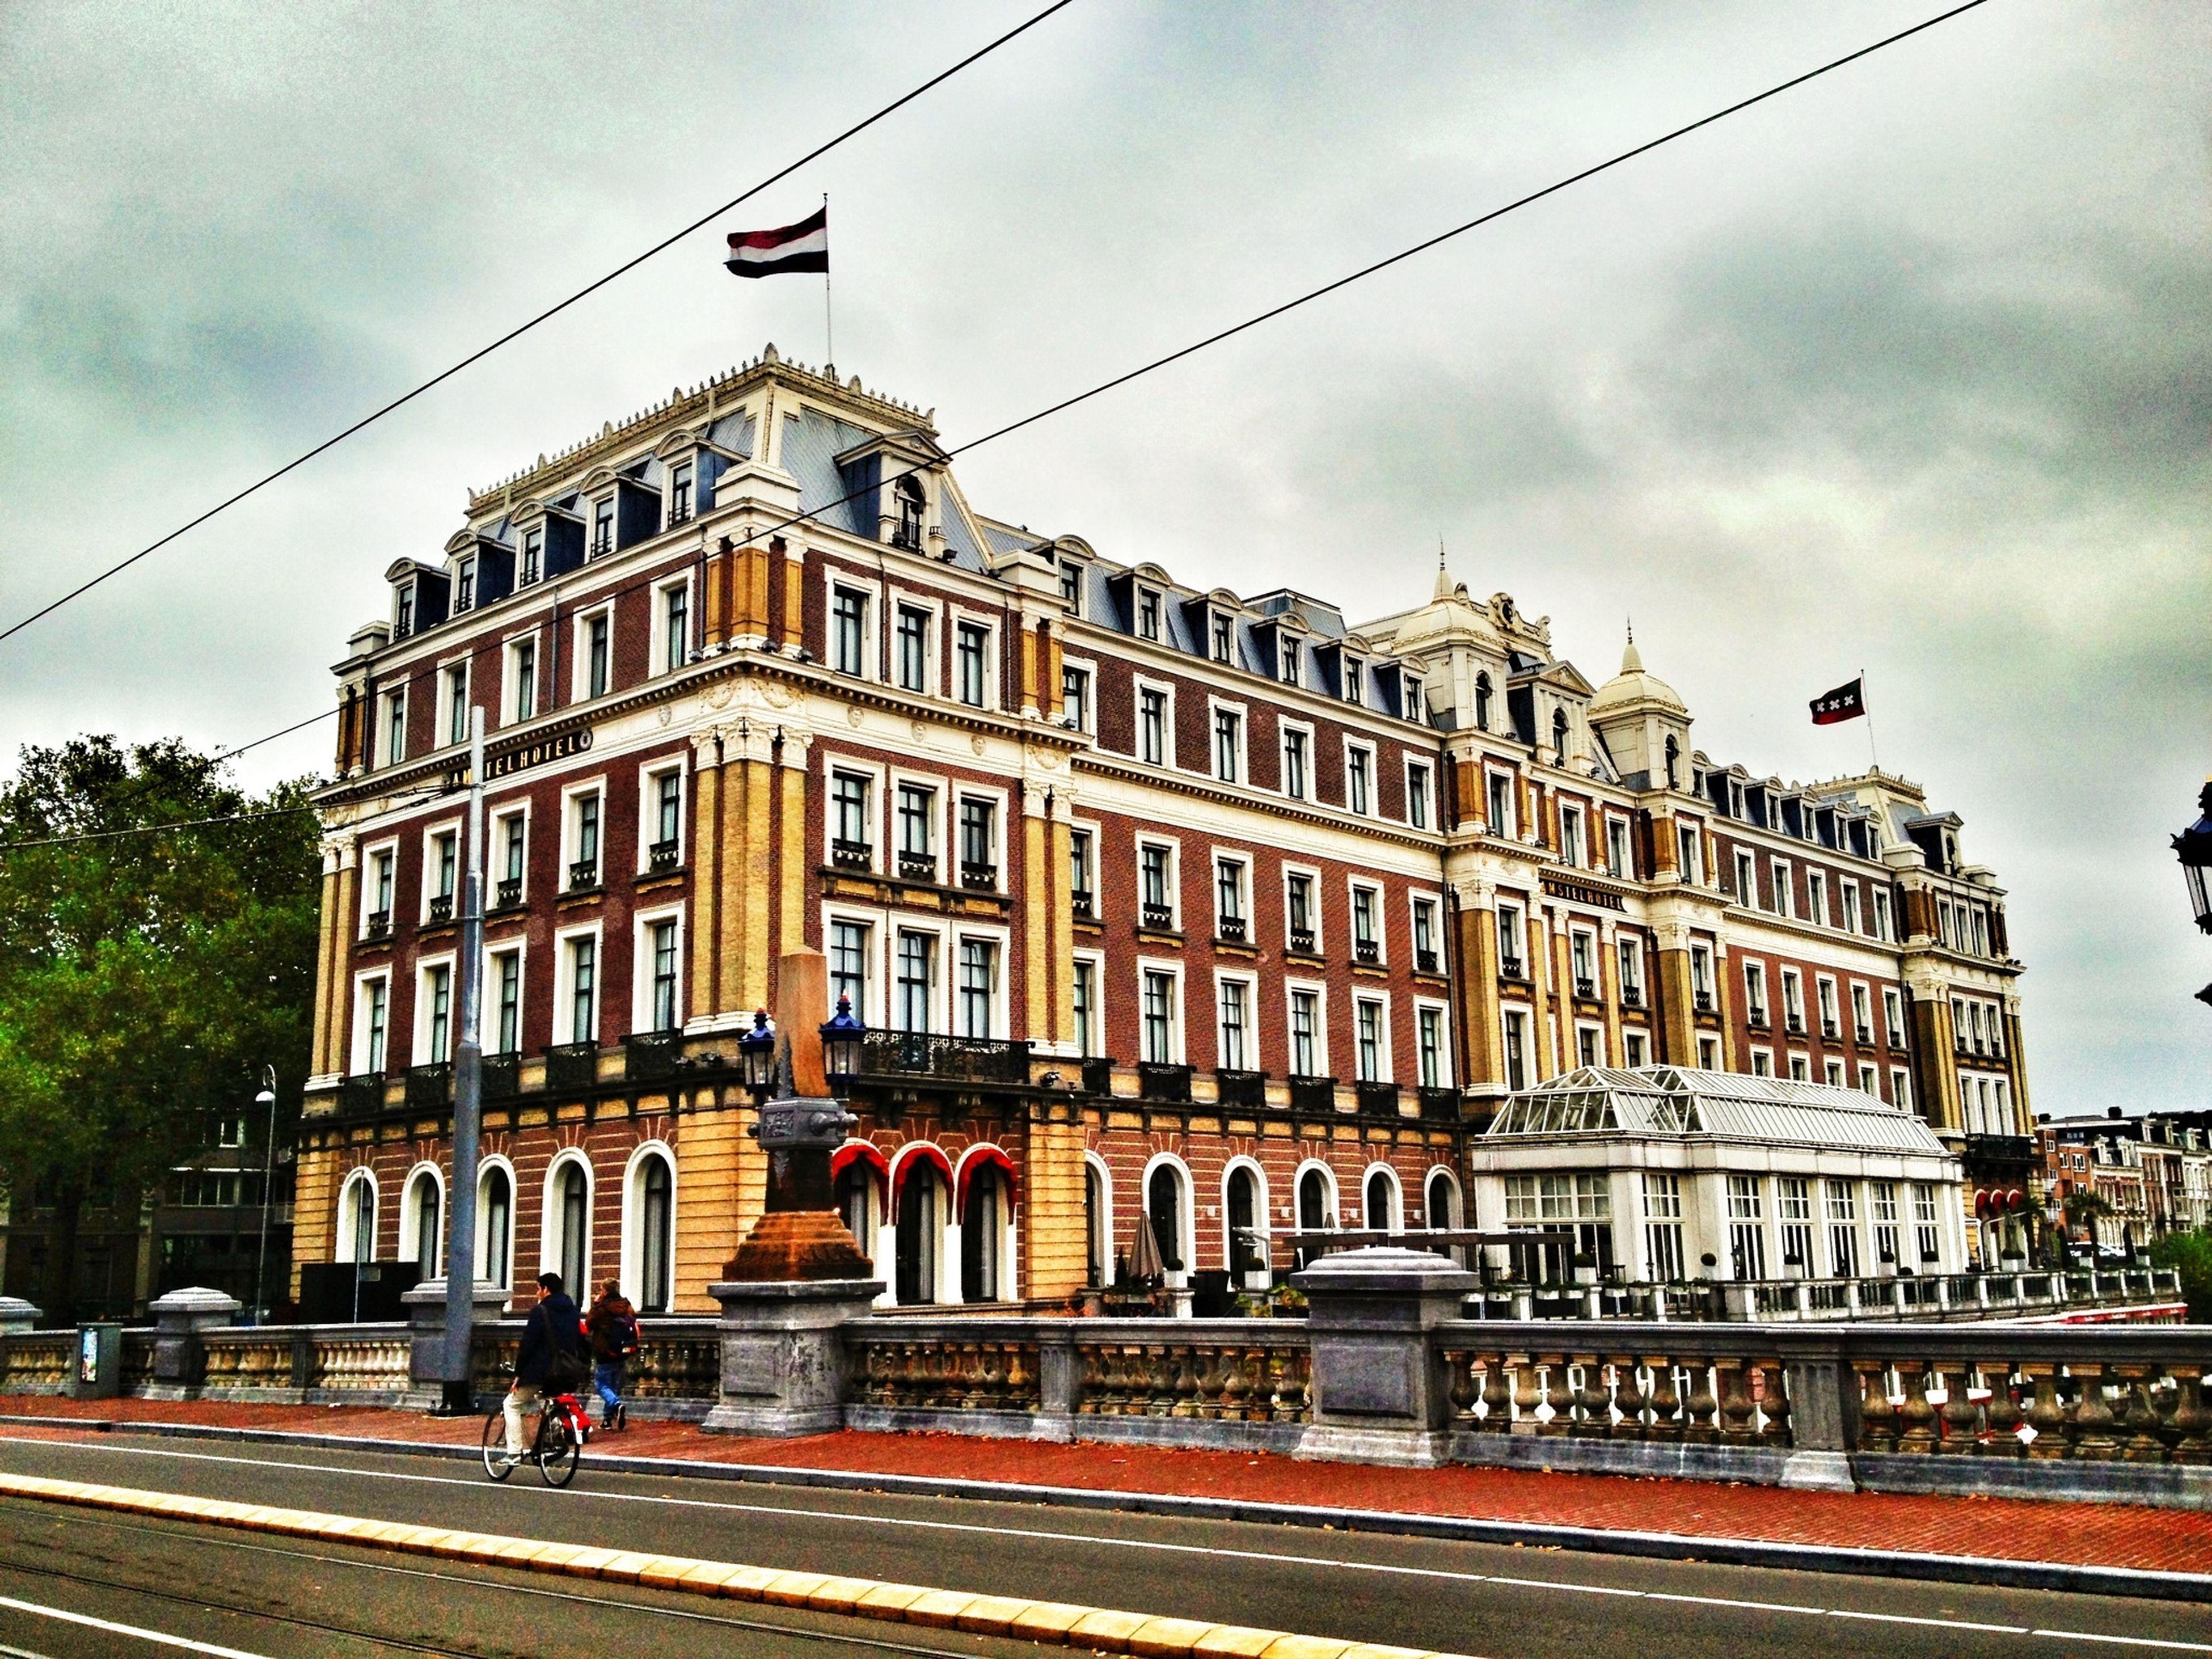 Amstel Hotel where John Lennon and Yoko Ono had their Love-in